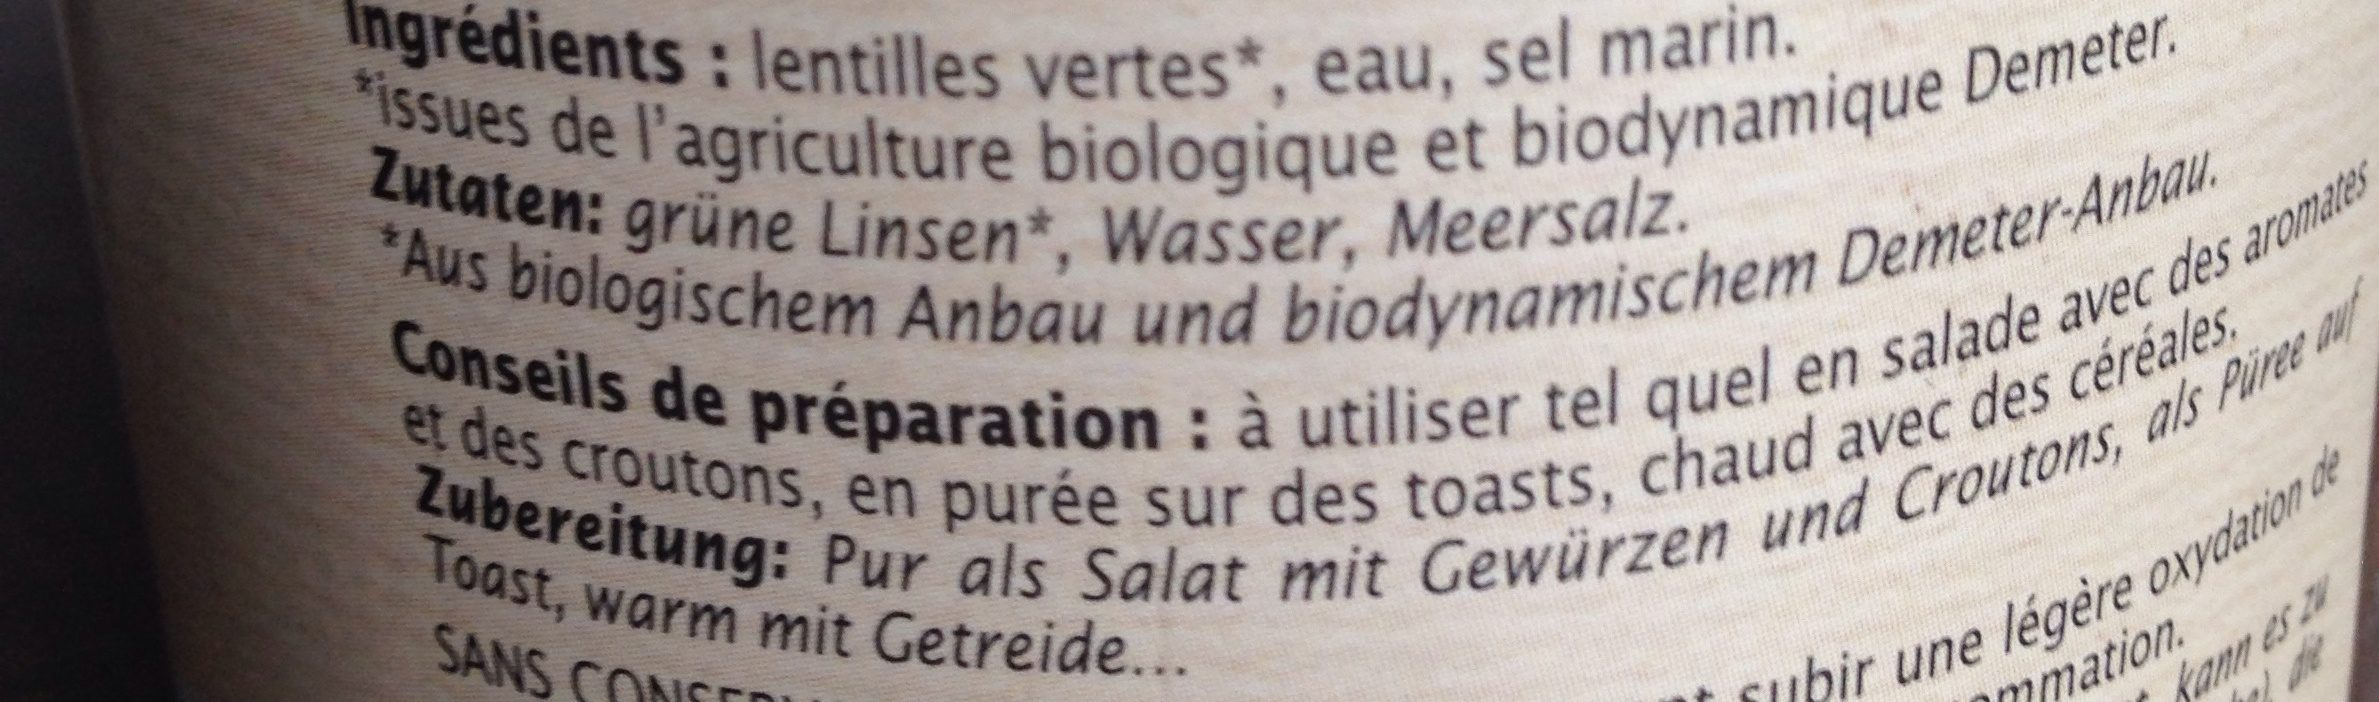 Lentilles Vertes Au Naturel - Ingrediënten - fr